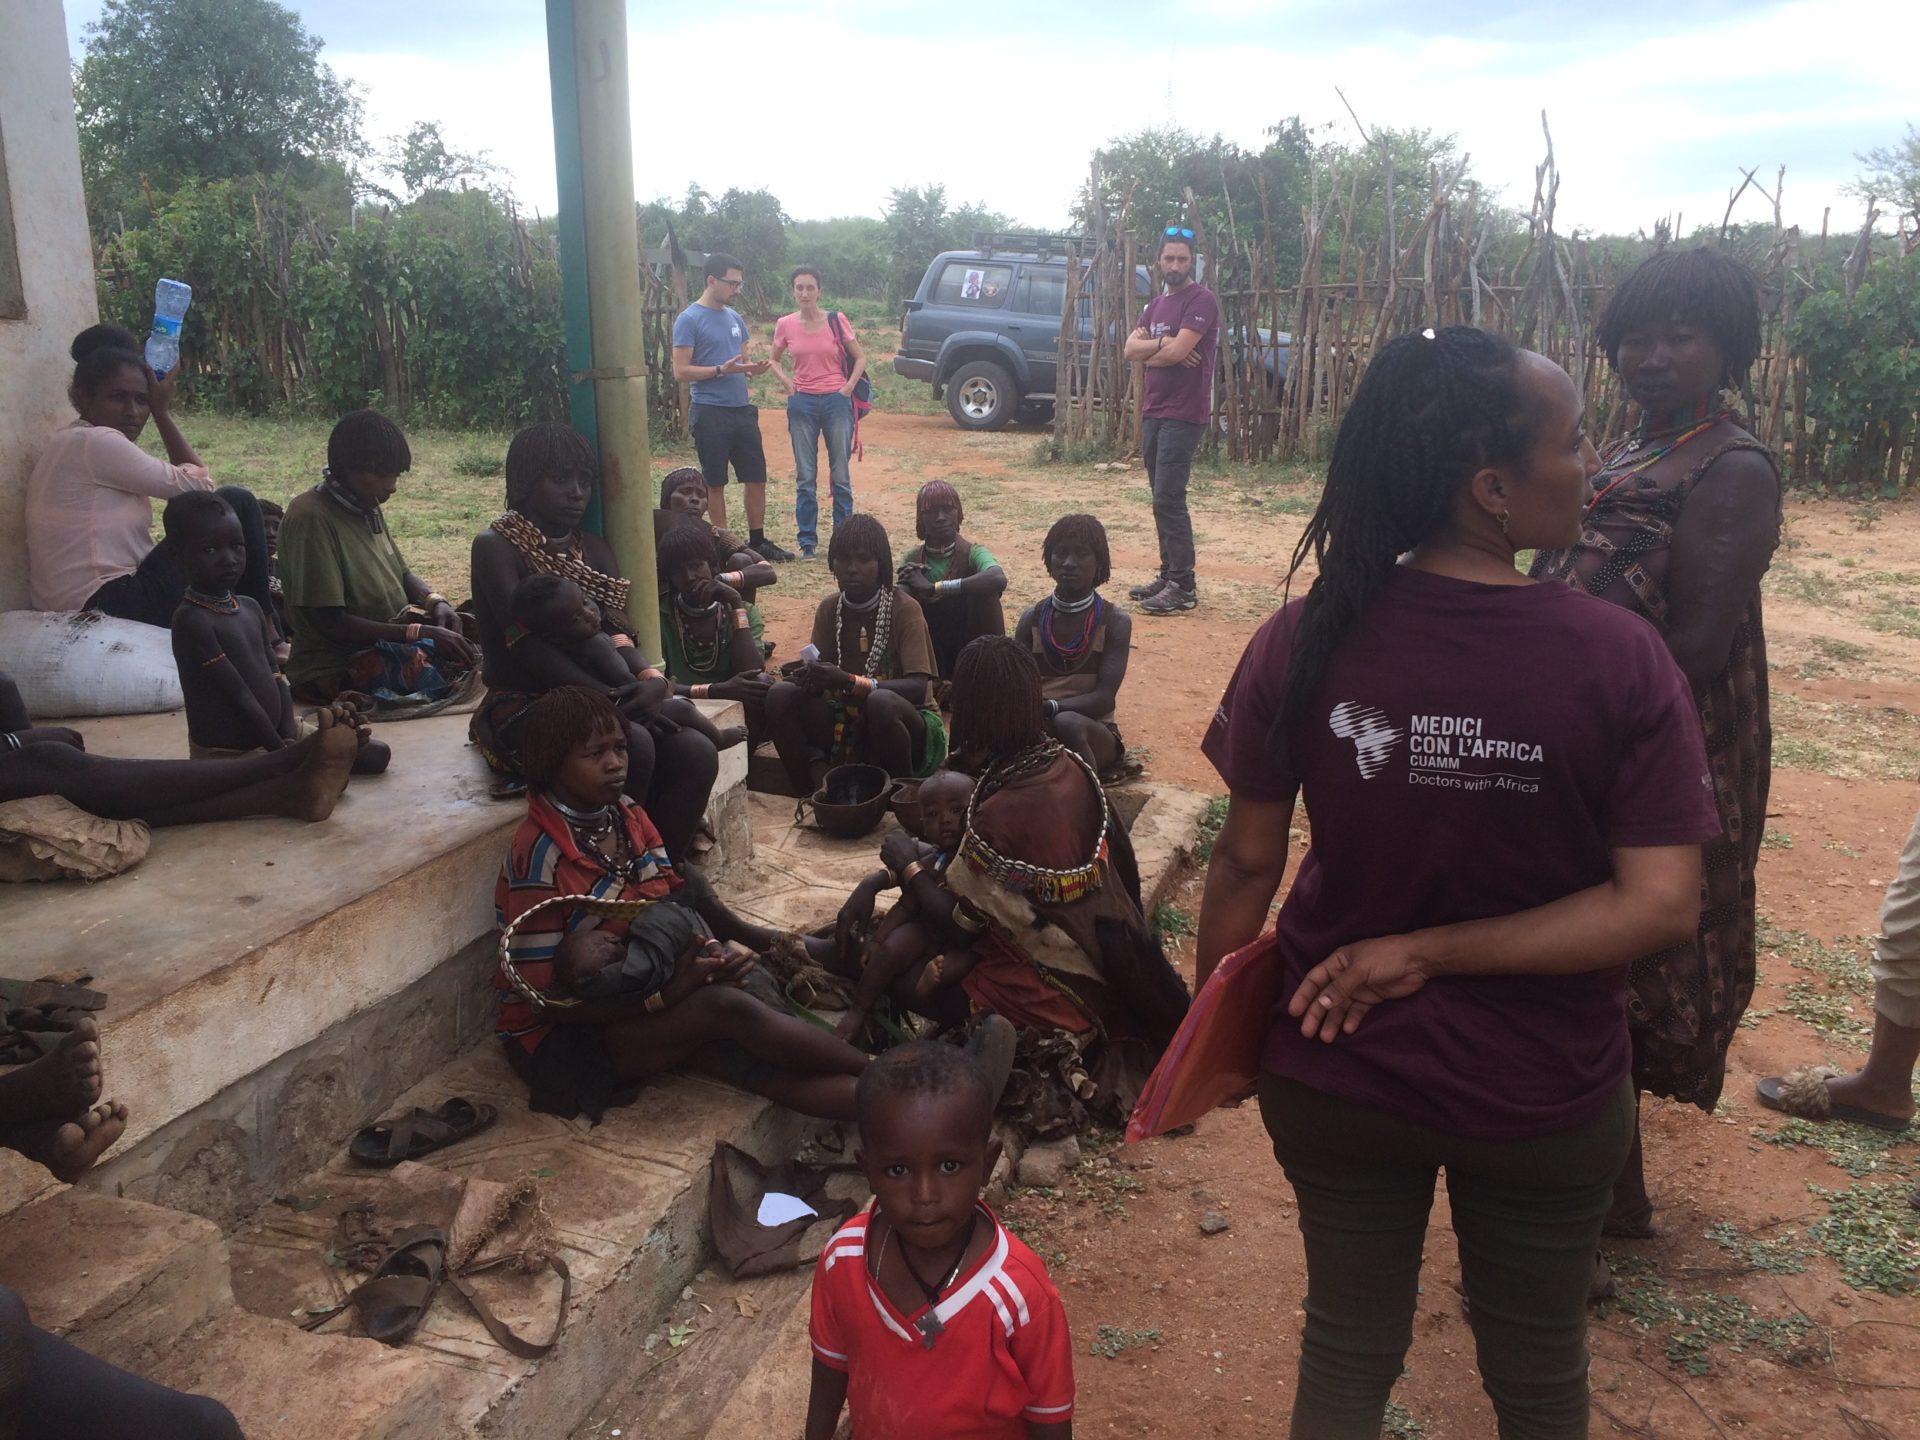 Access to healthcare for women, Caritas Pro Vitae Gradu Charitable Trust, Ariane Slinger